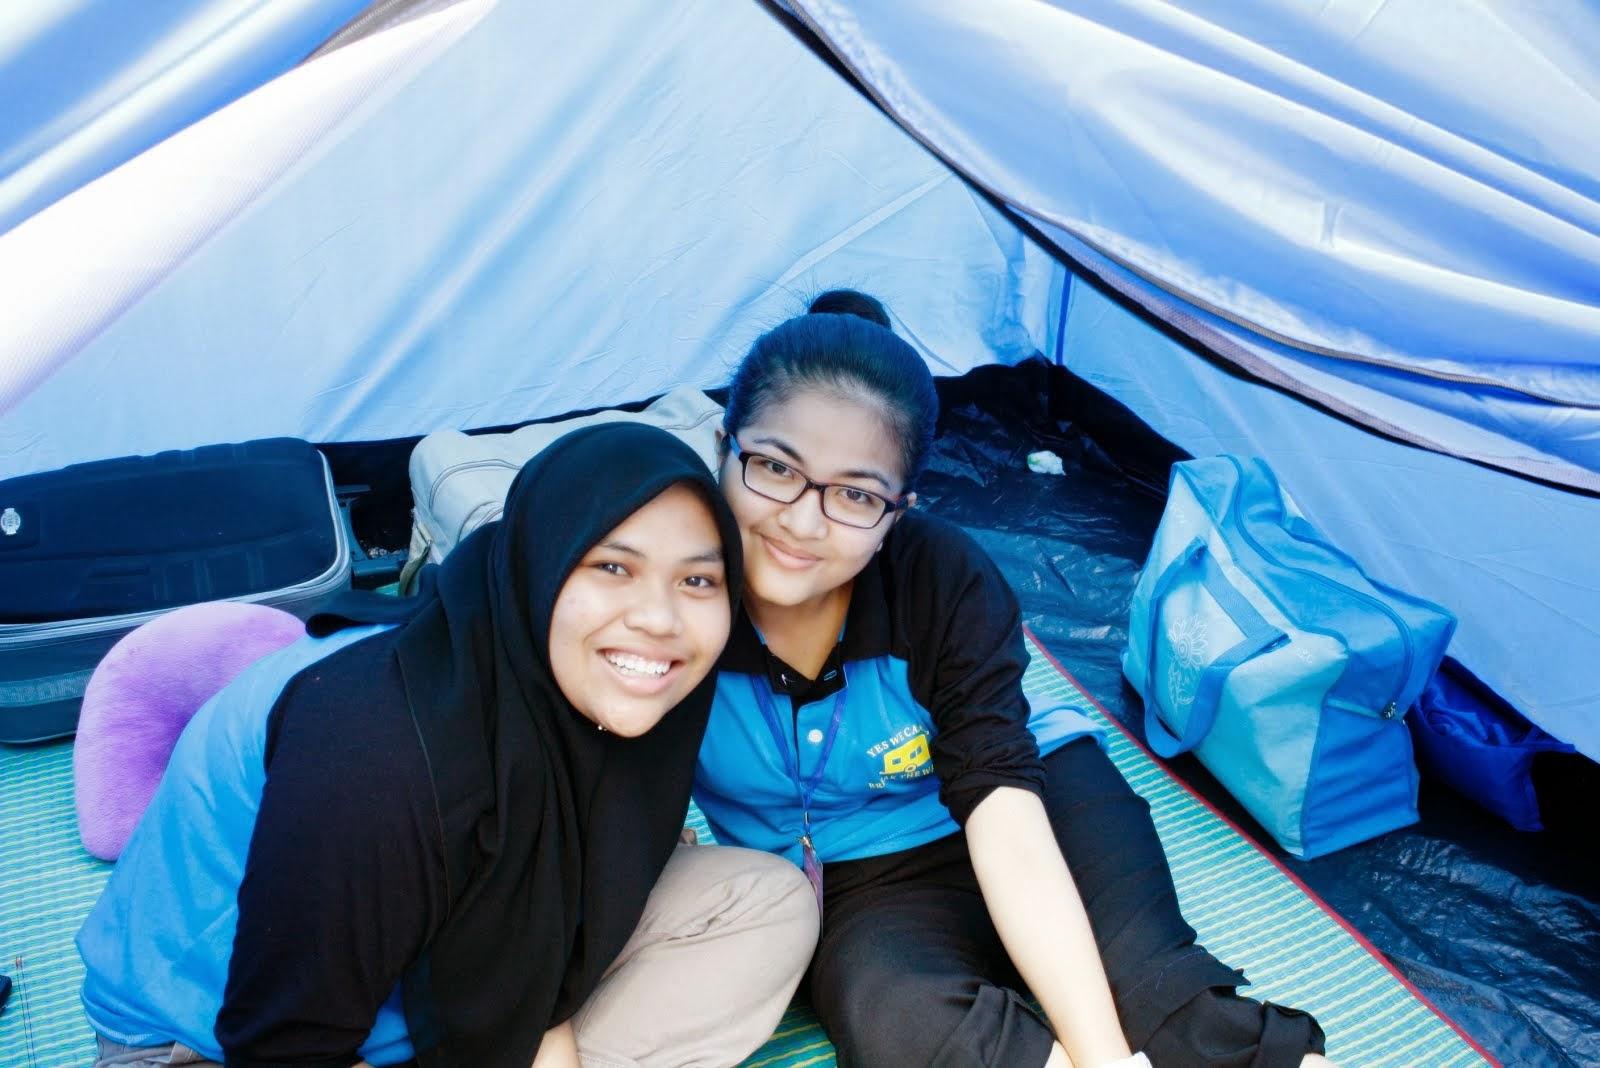 With Wanikda